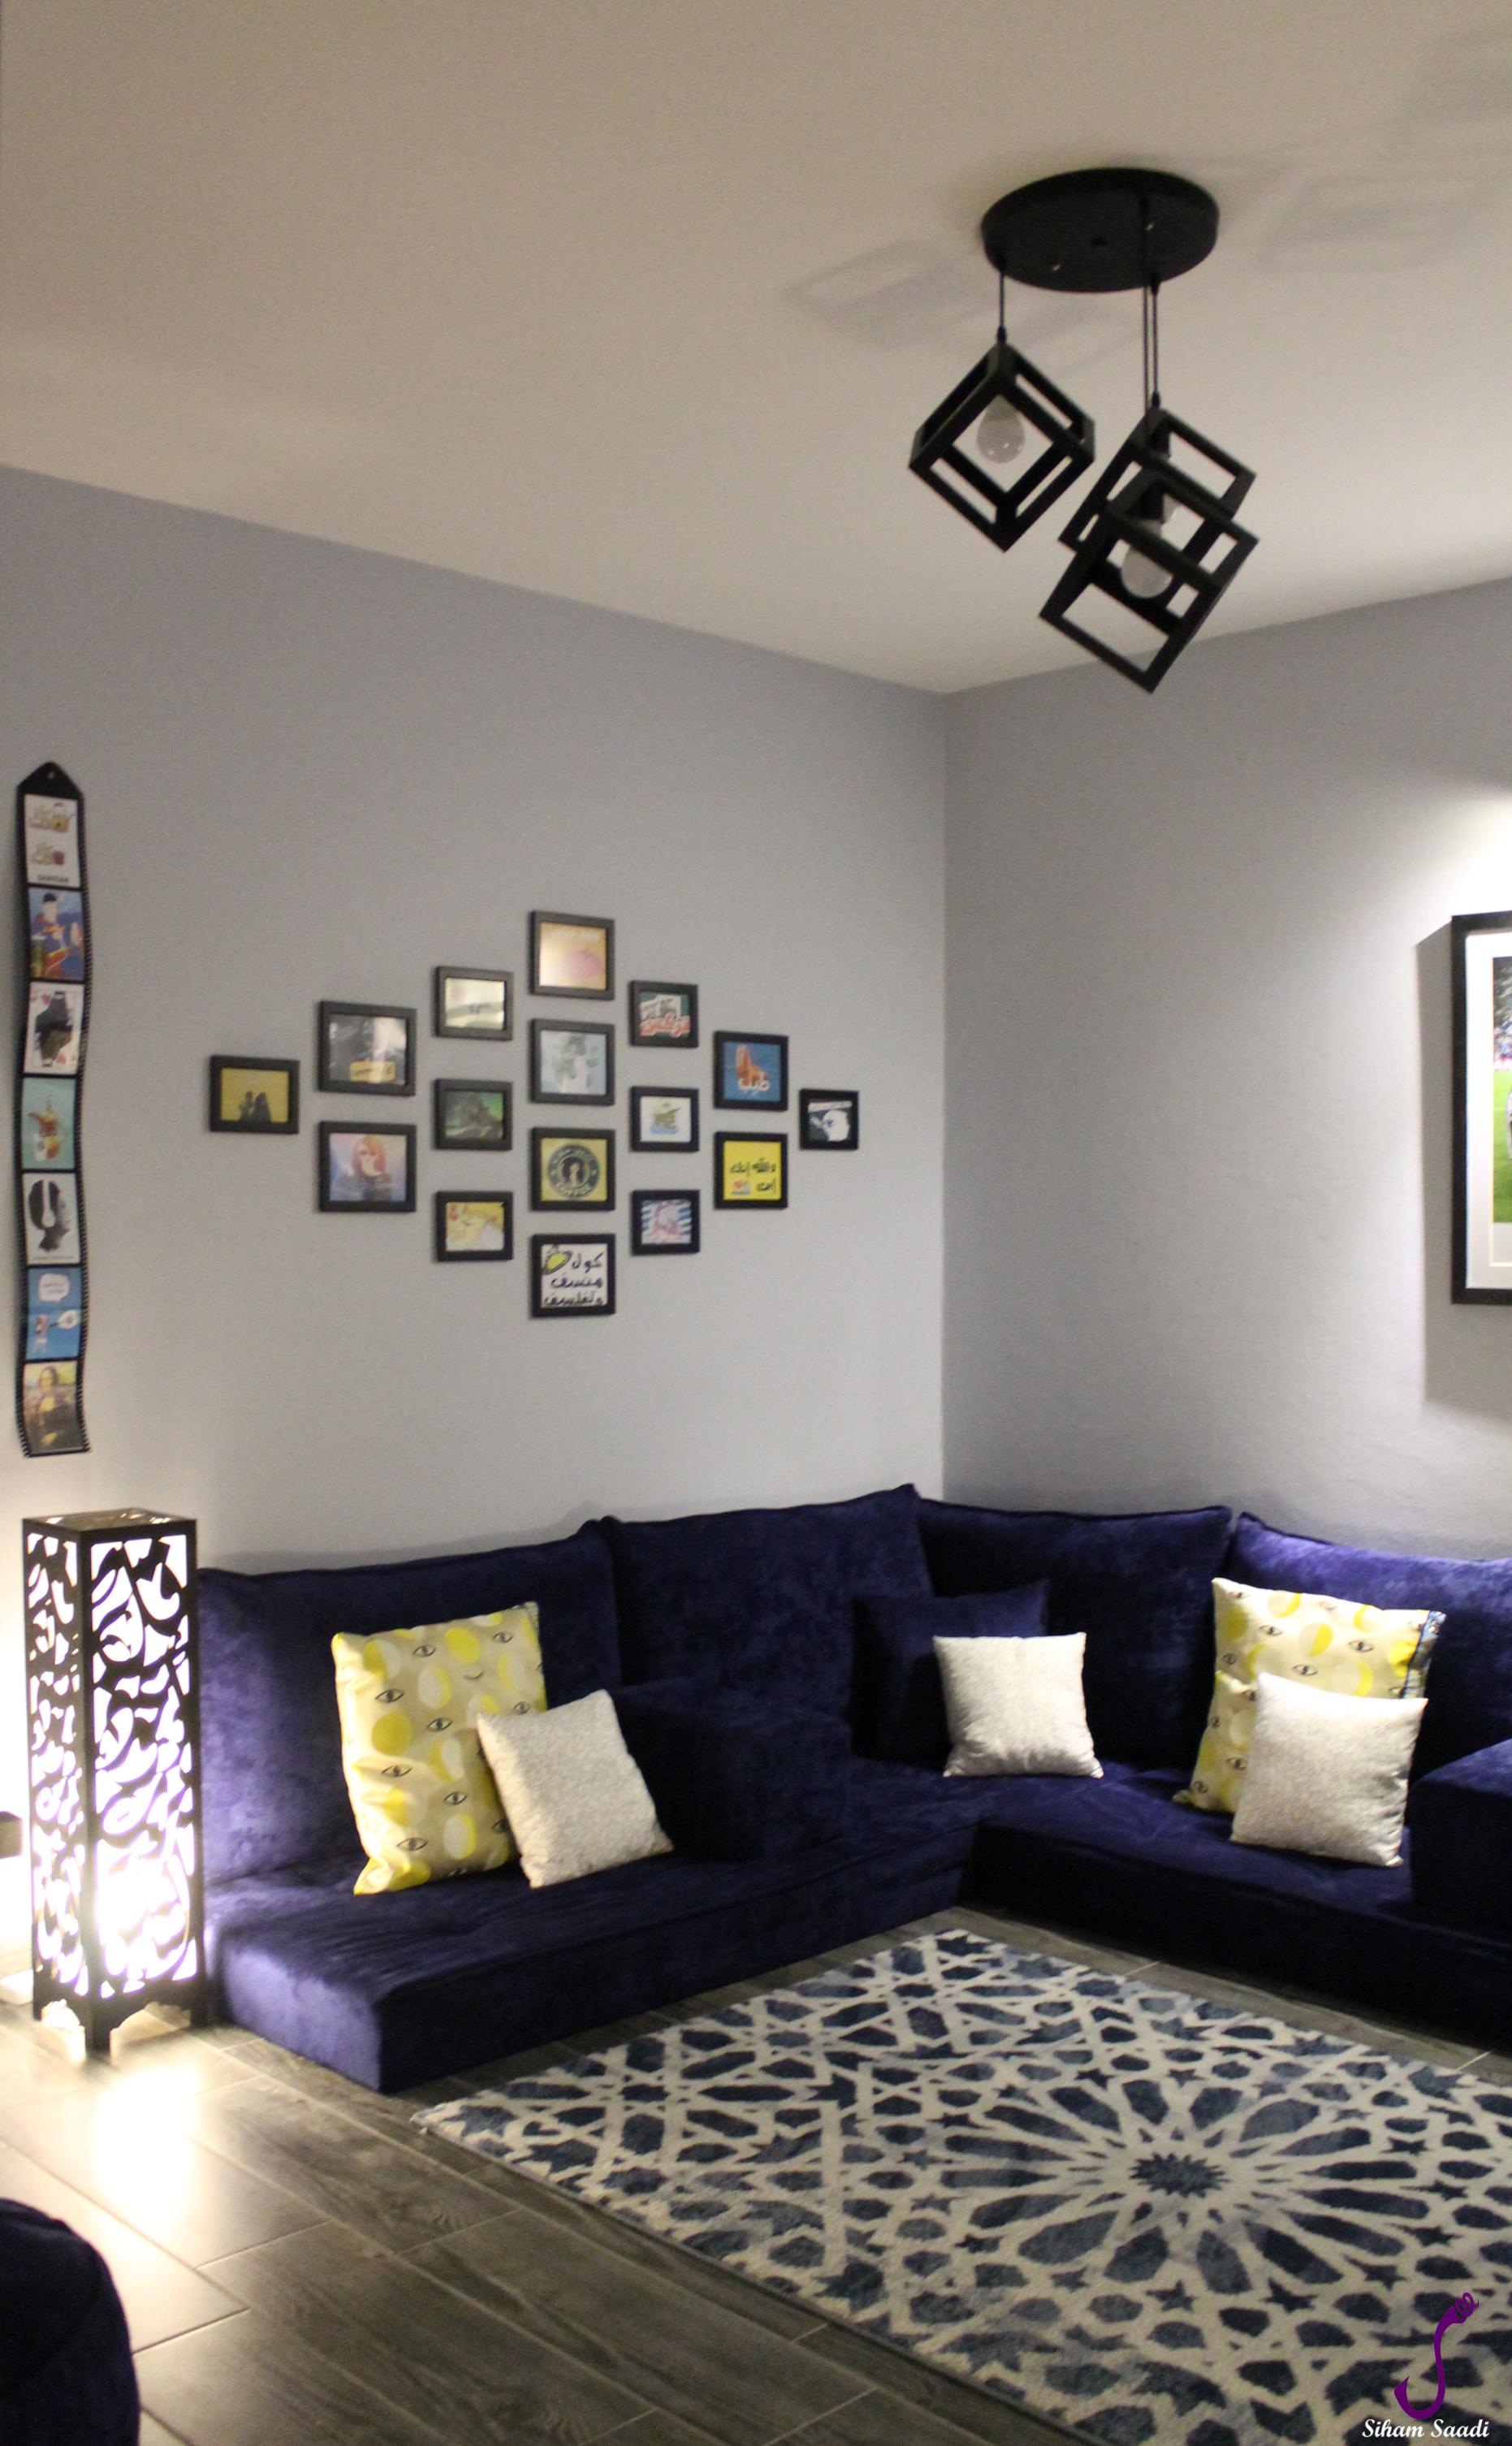 Modern Arabic Majlis Rental Home Decor Living Room Seating Ideas Without Sofa Home Decor